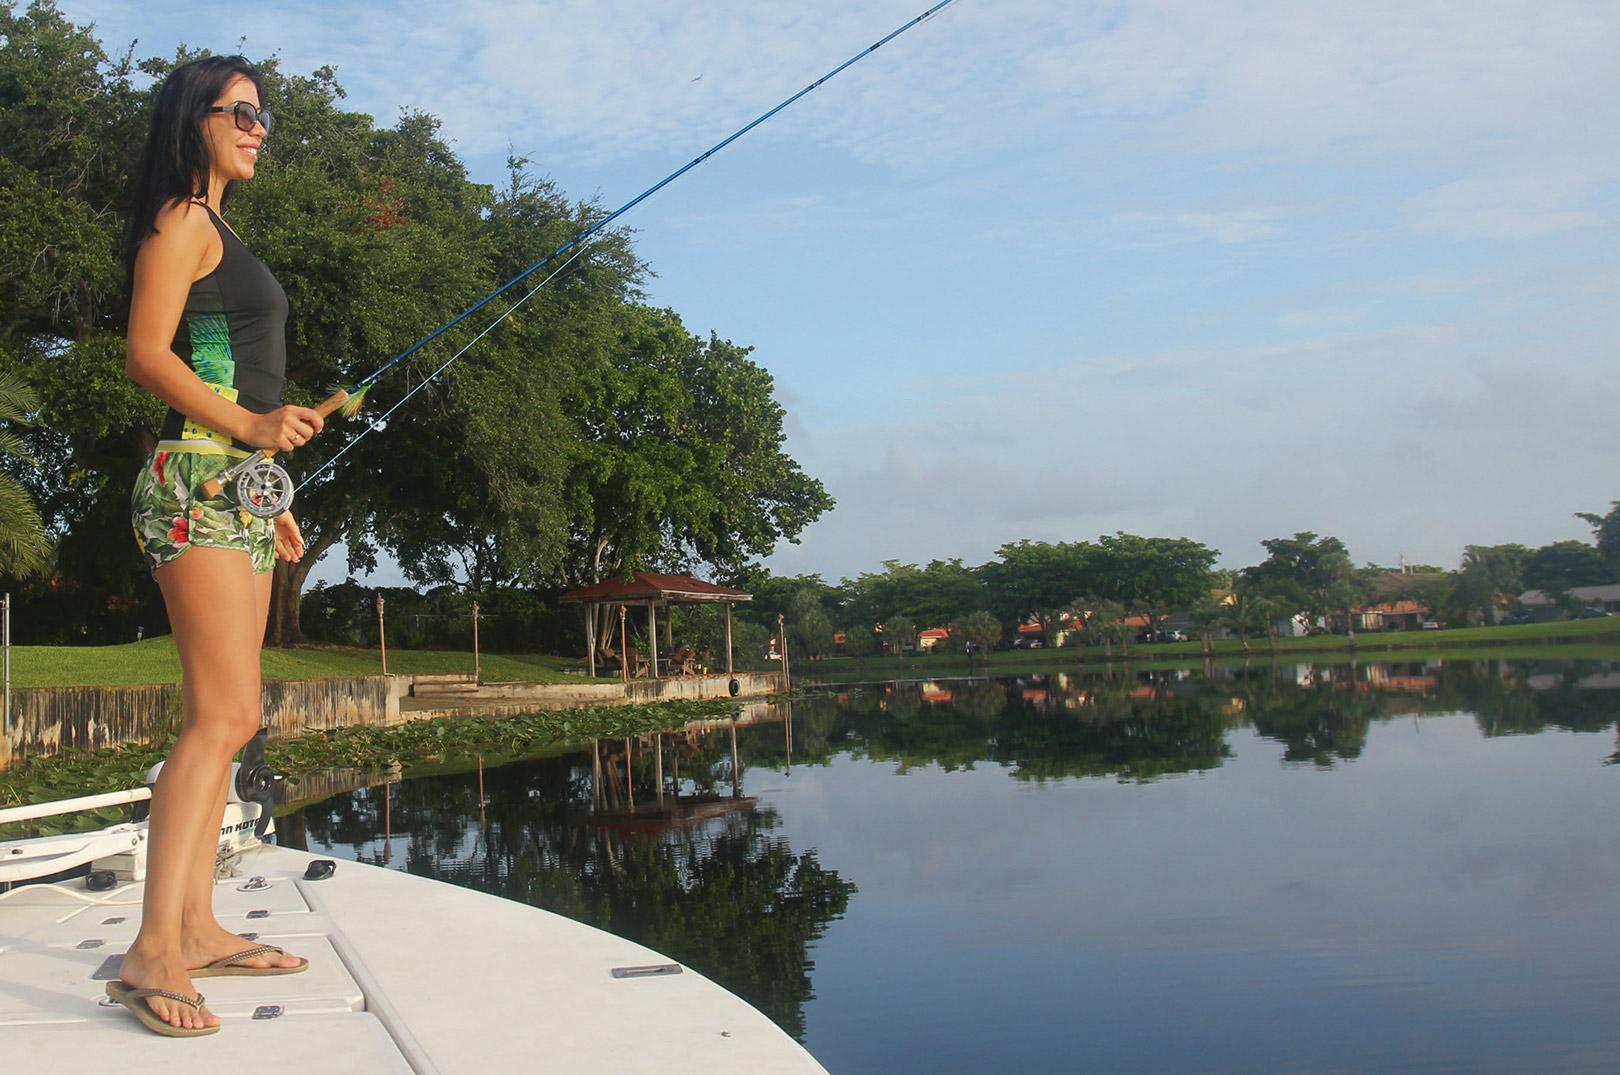 Fiskeriet er 100% sightfishing, og heldigvis er solen tit fremme i Miami, hvilket gør det lettere at spotte fiskene.